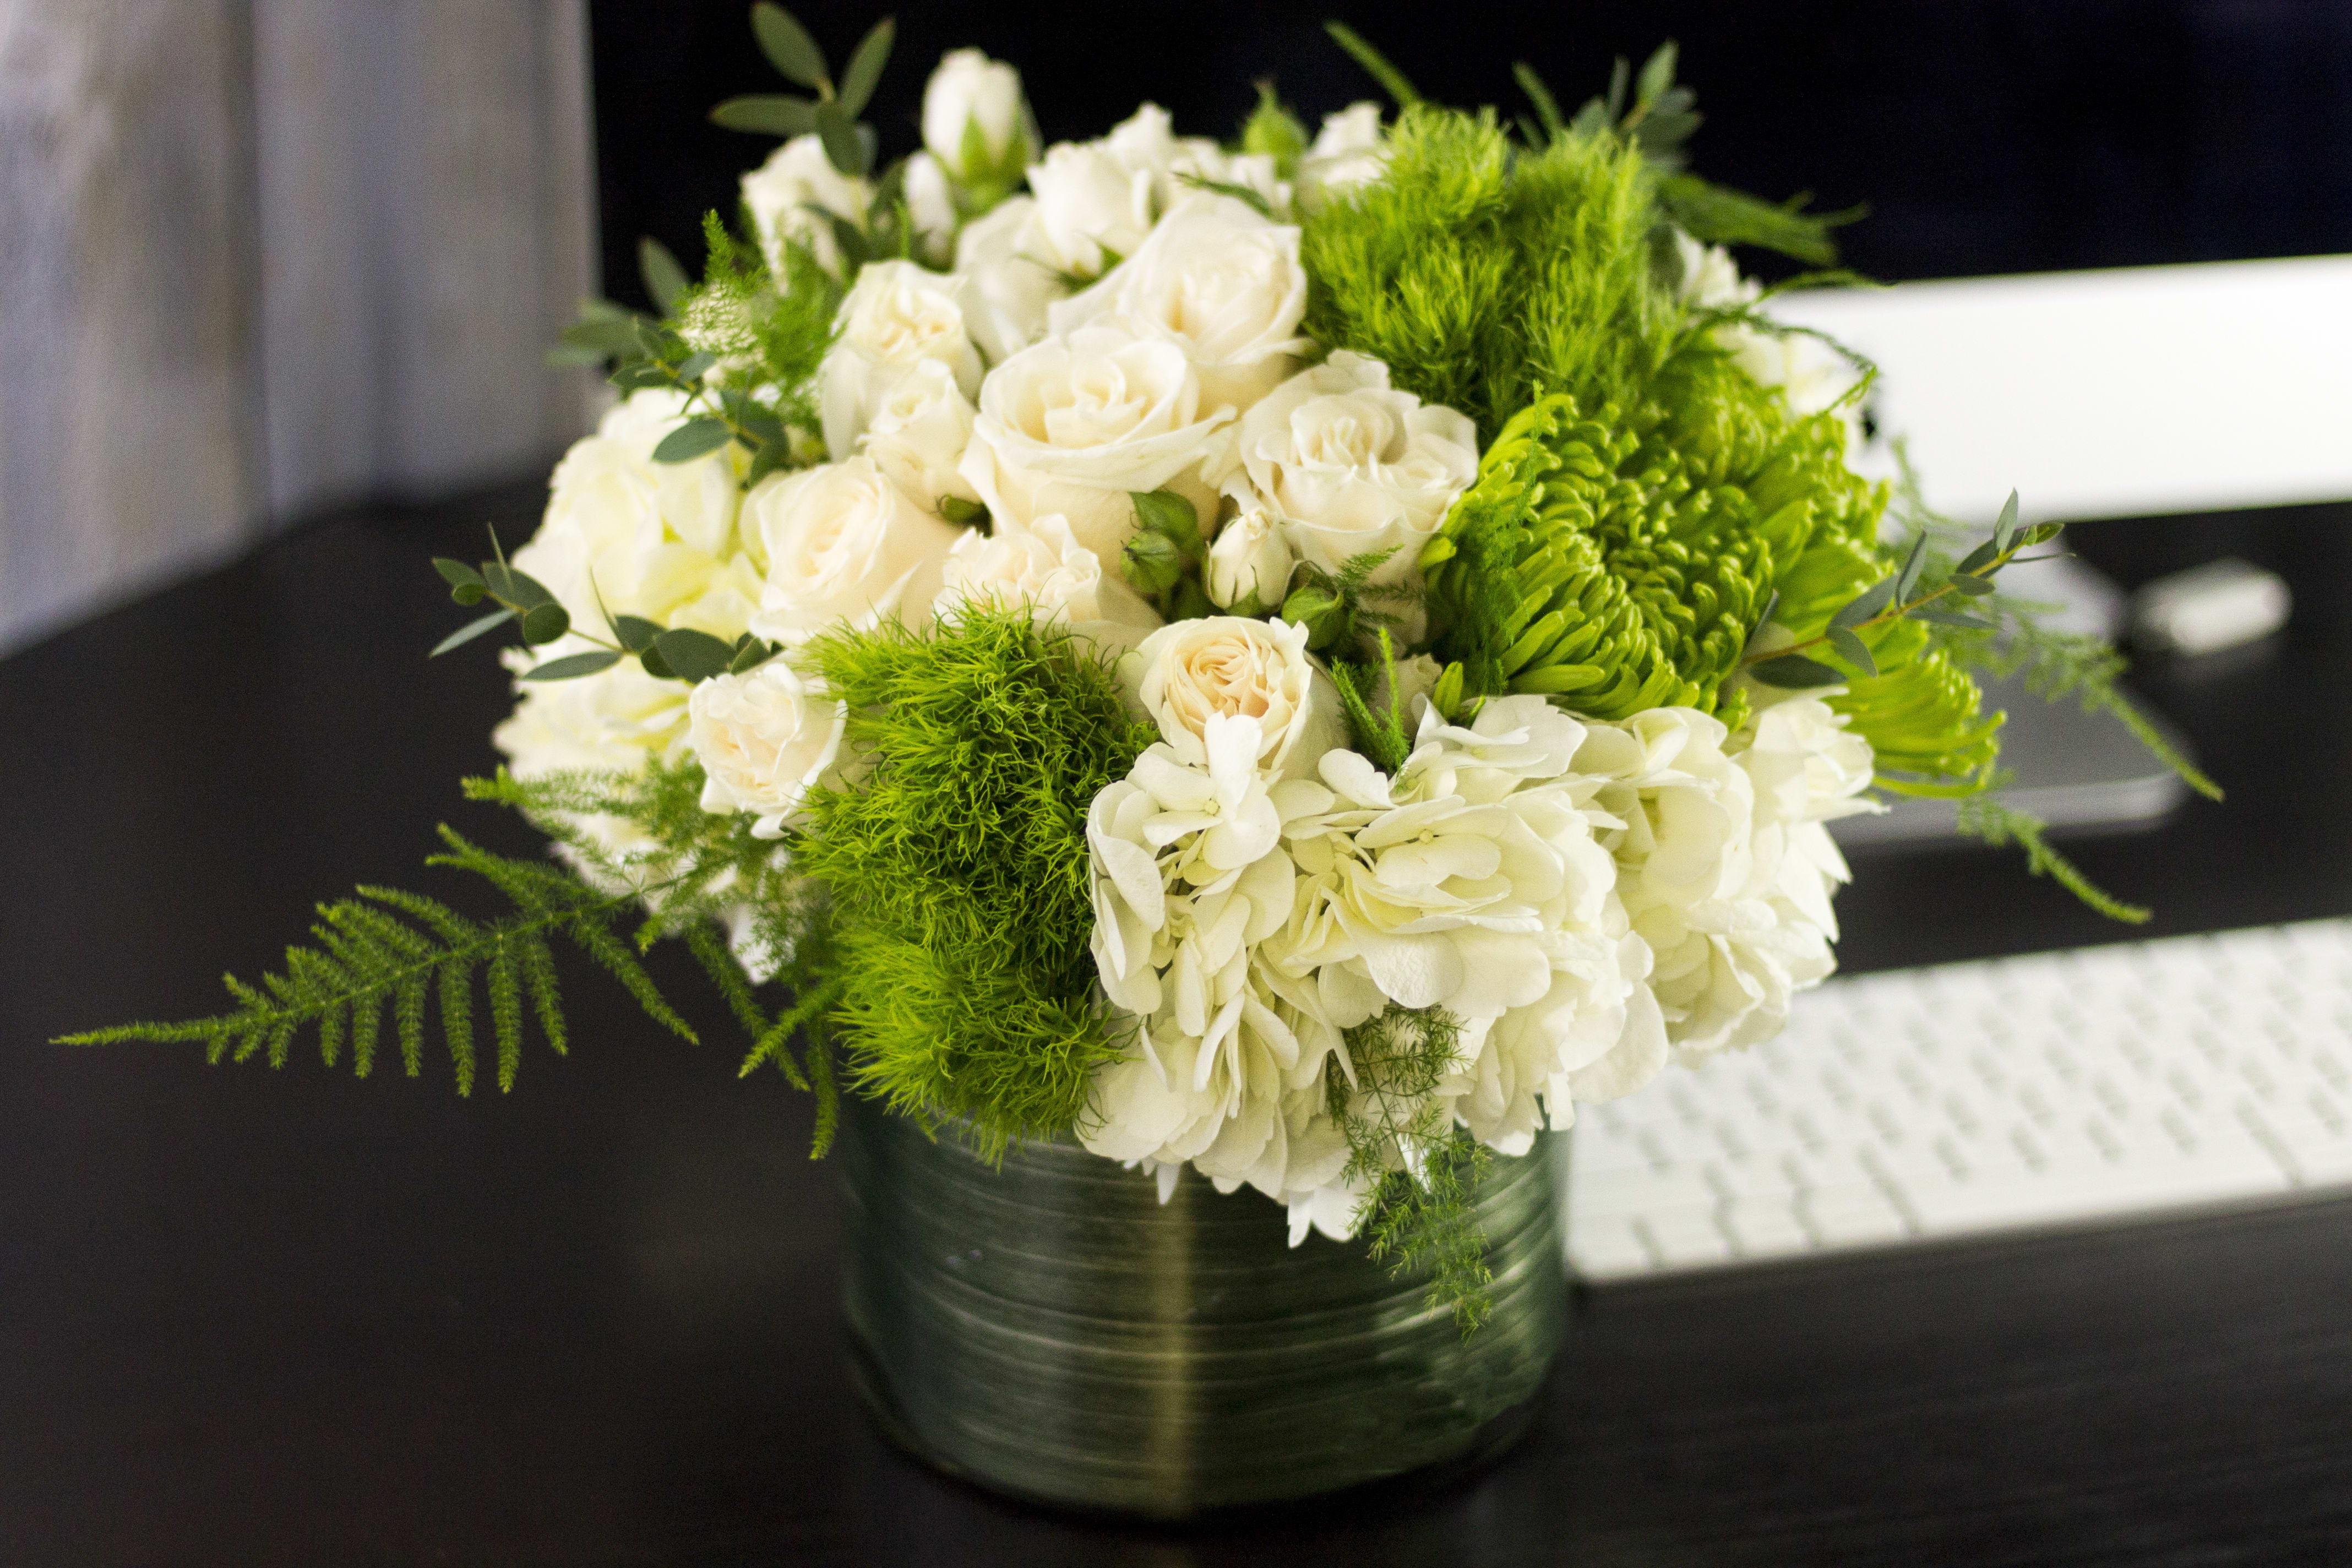 Green and White Flower Arrangement